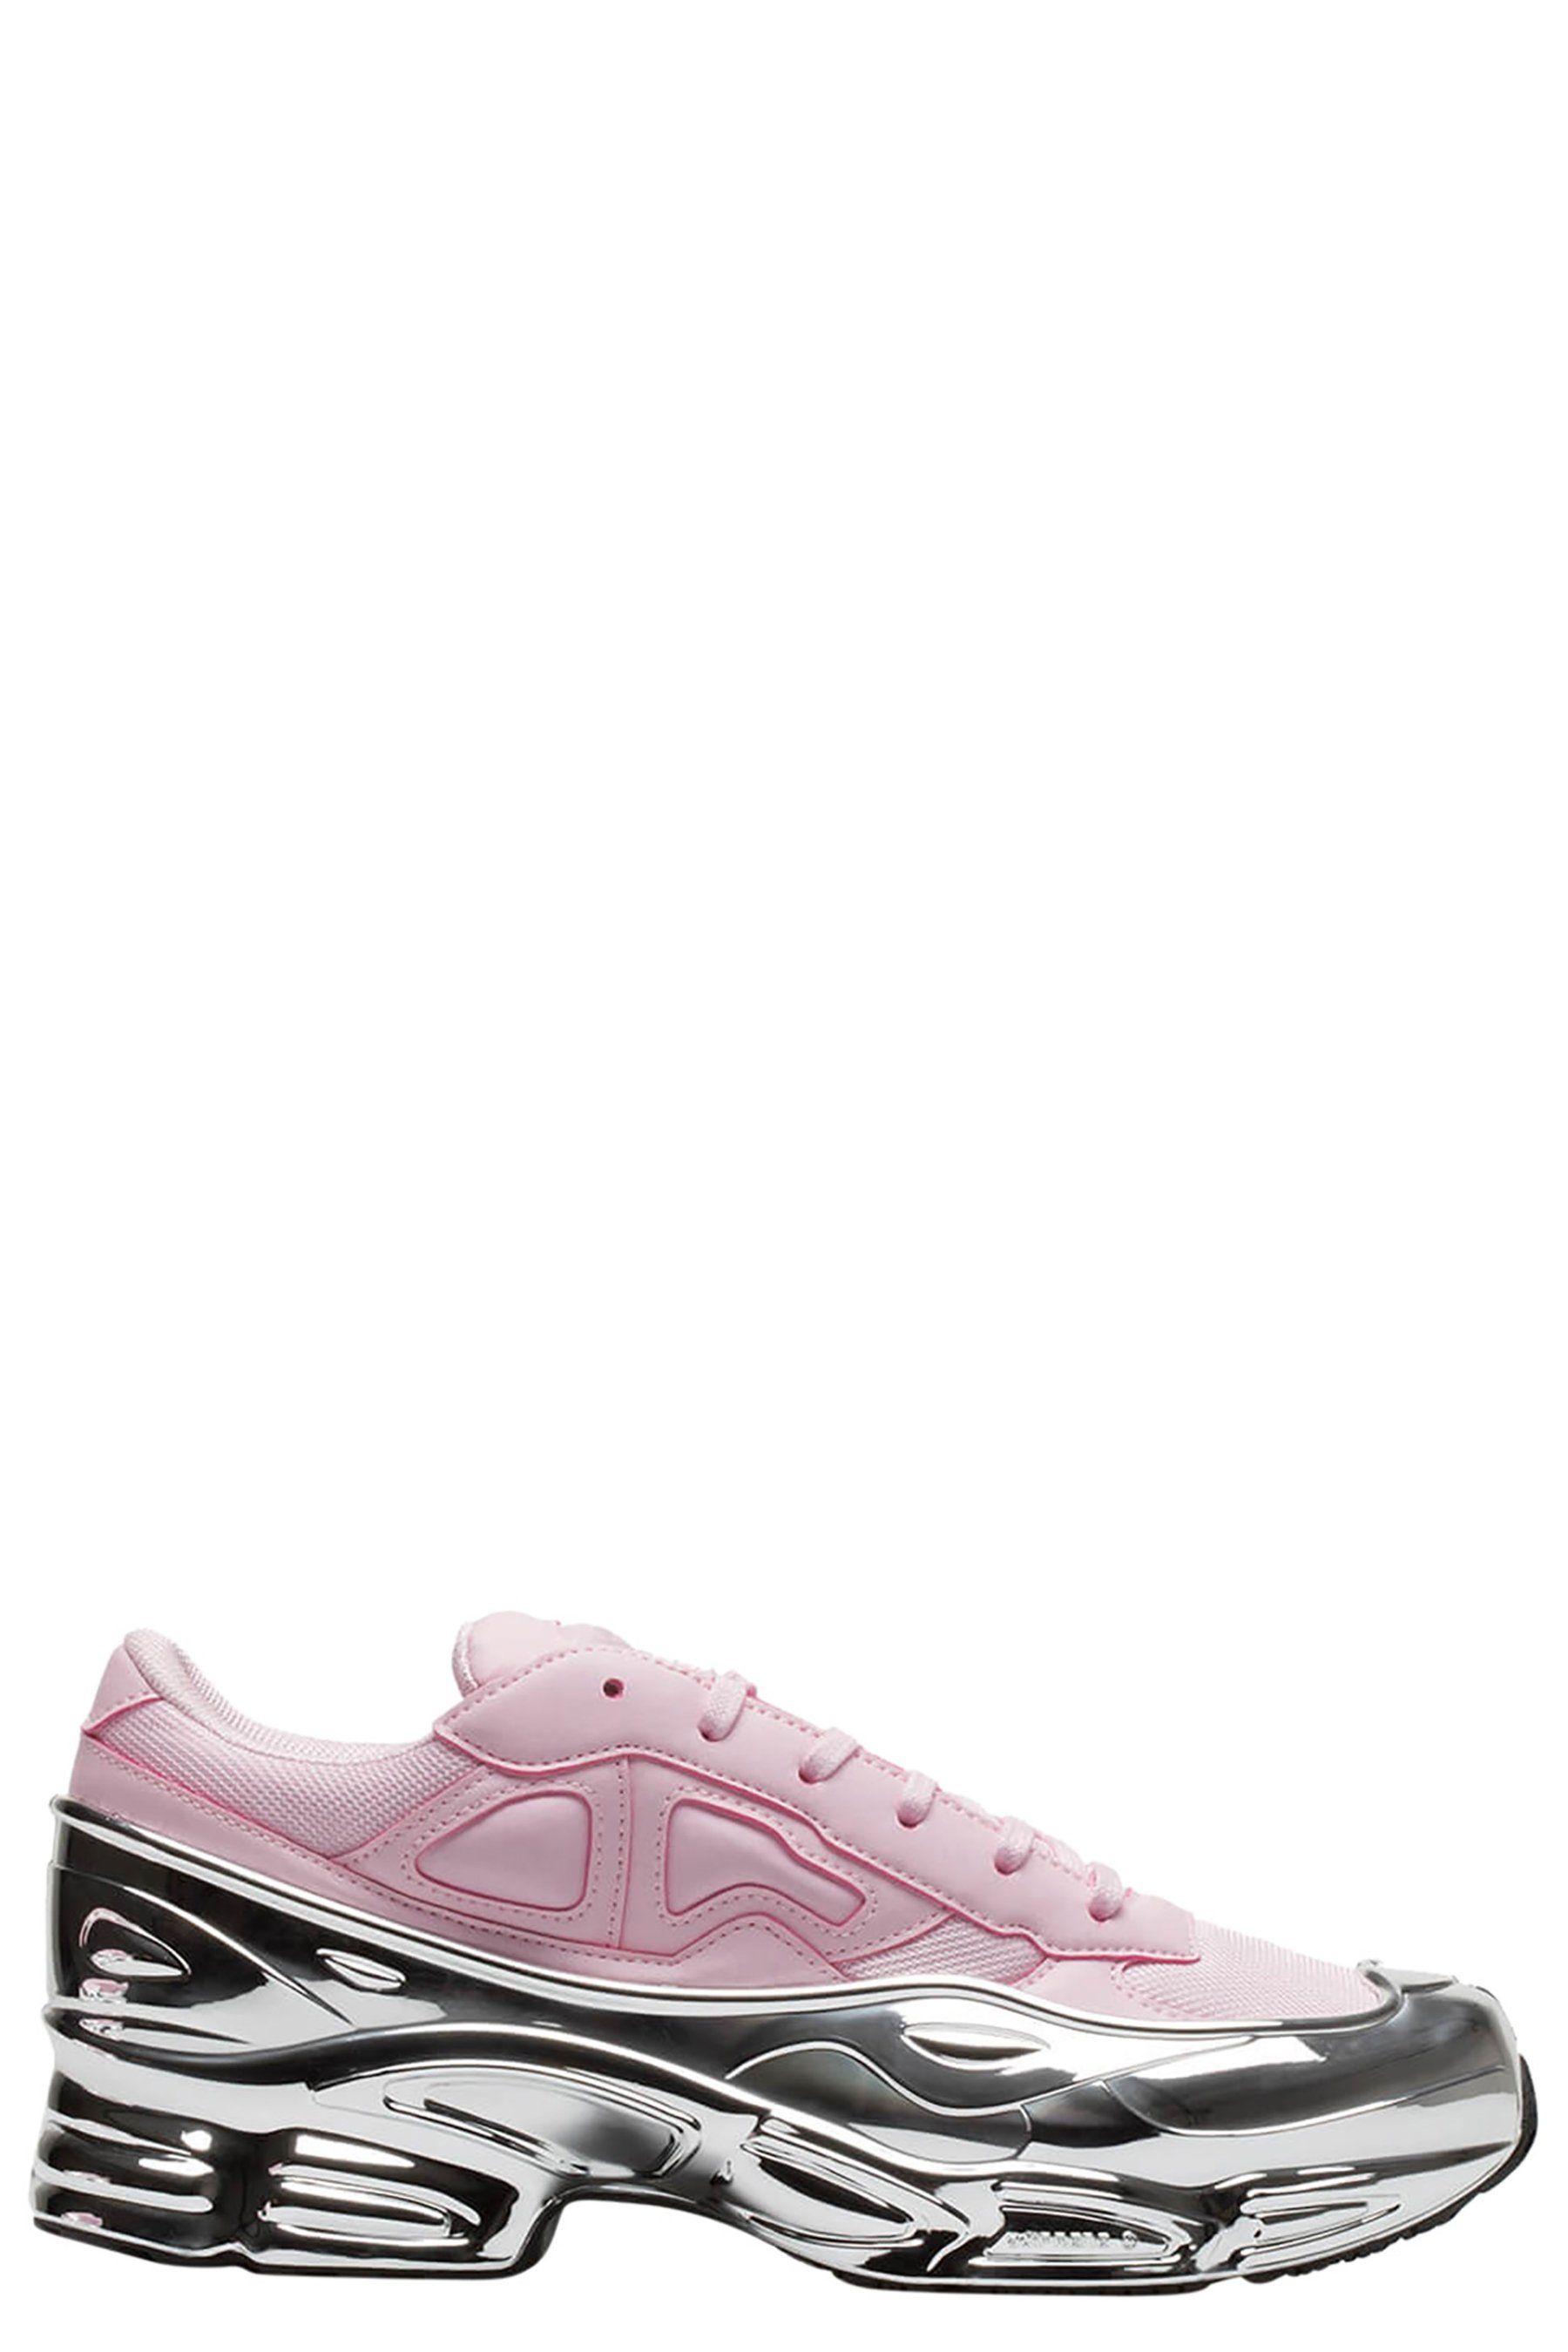 adidas kleur roze